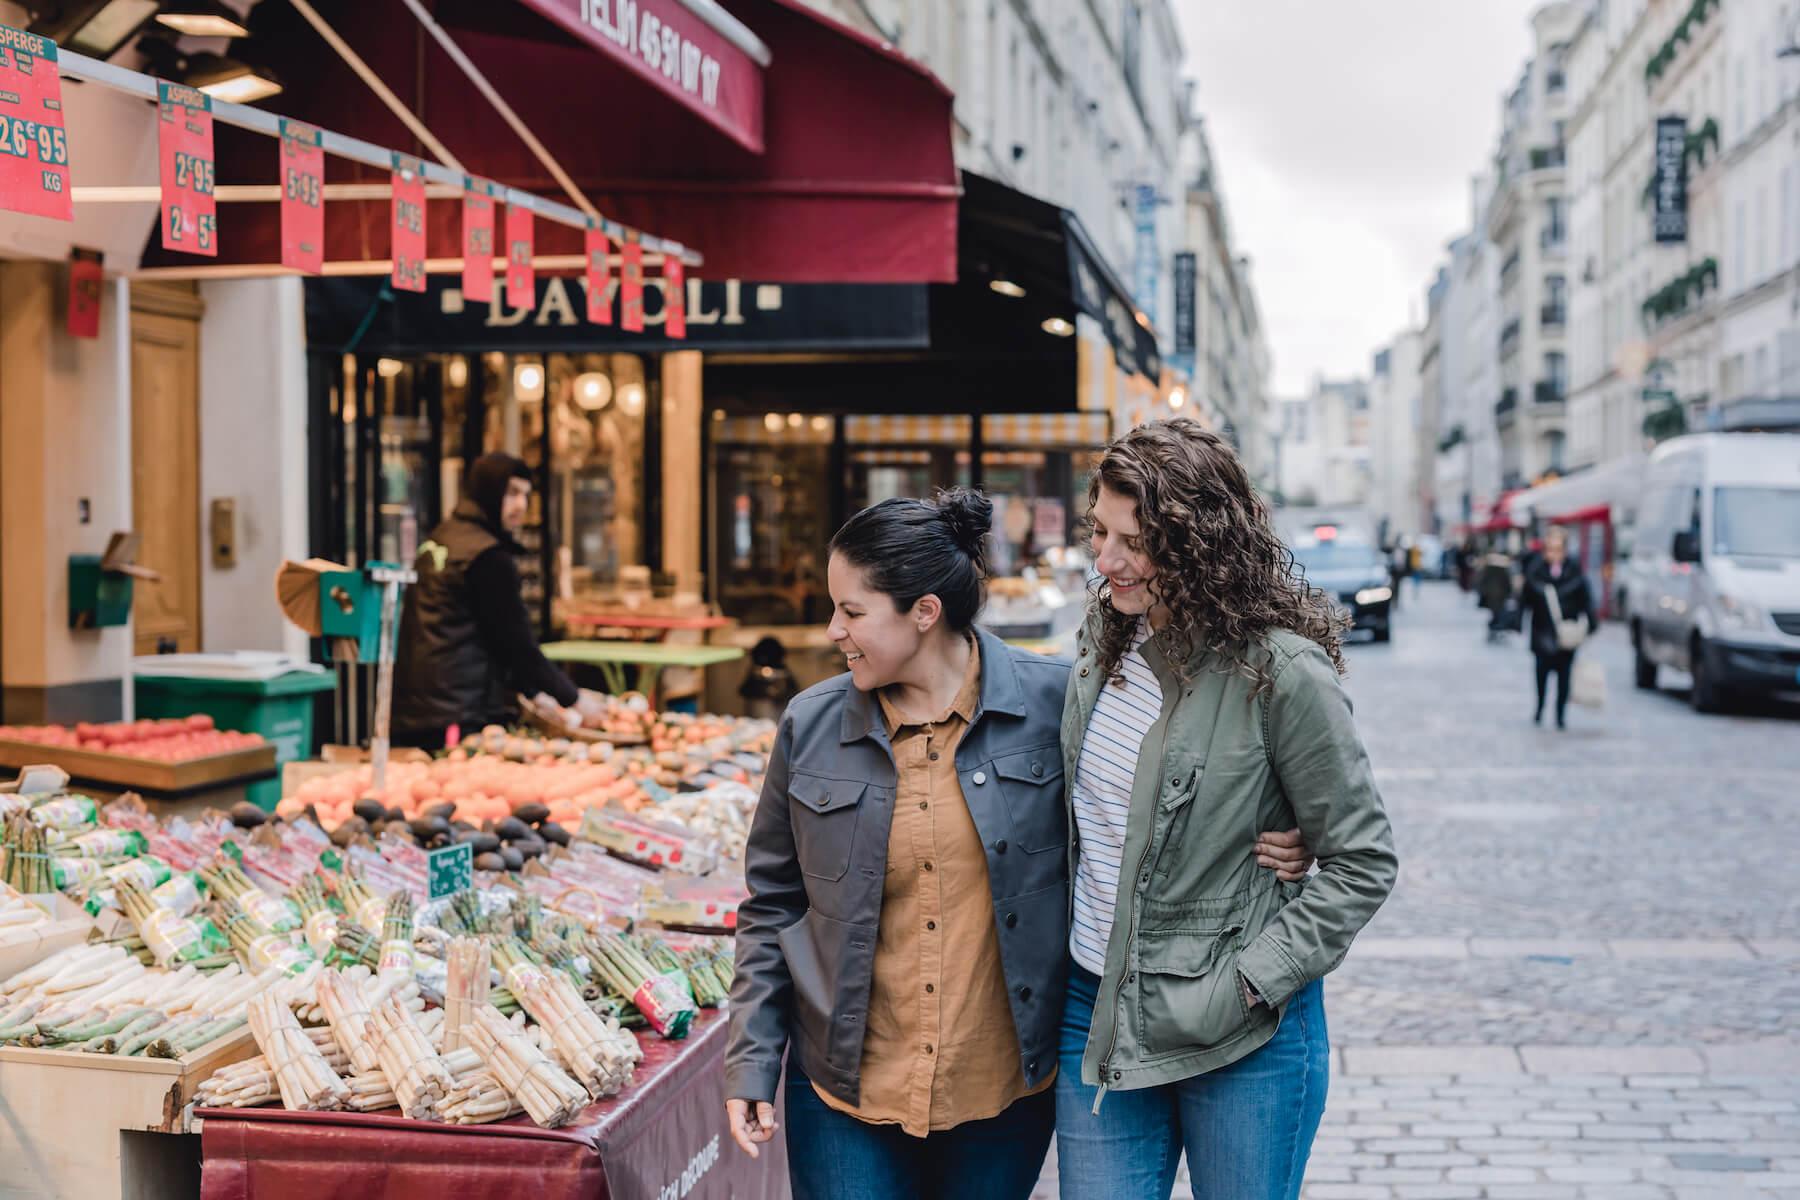 paris-03-06-2020-engagement-trip-37_original